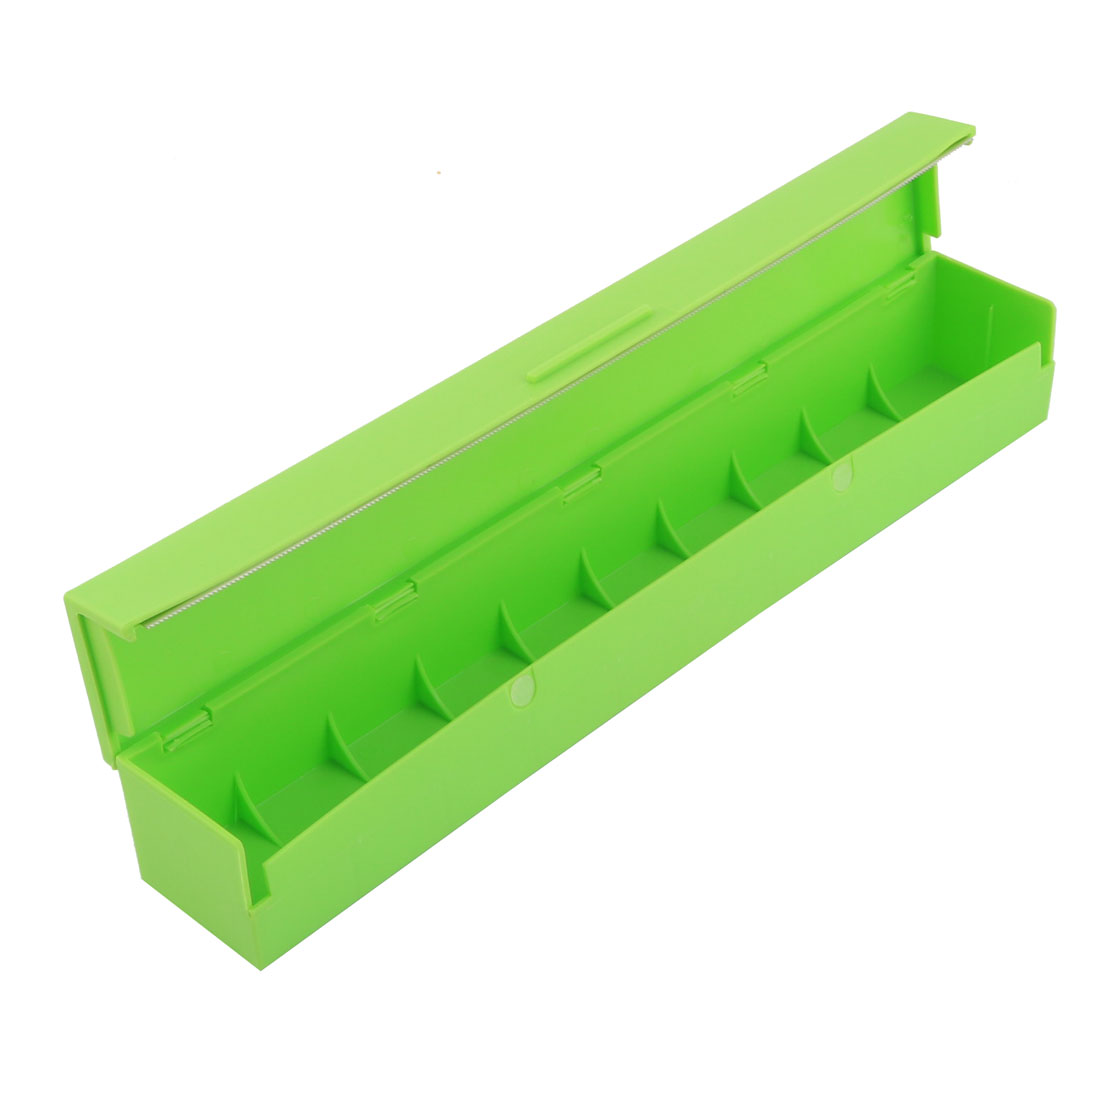 Household Kitchen Plastic Food Wrap Fresh-keeping Film Paper Dispenser Cutter Green